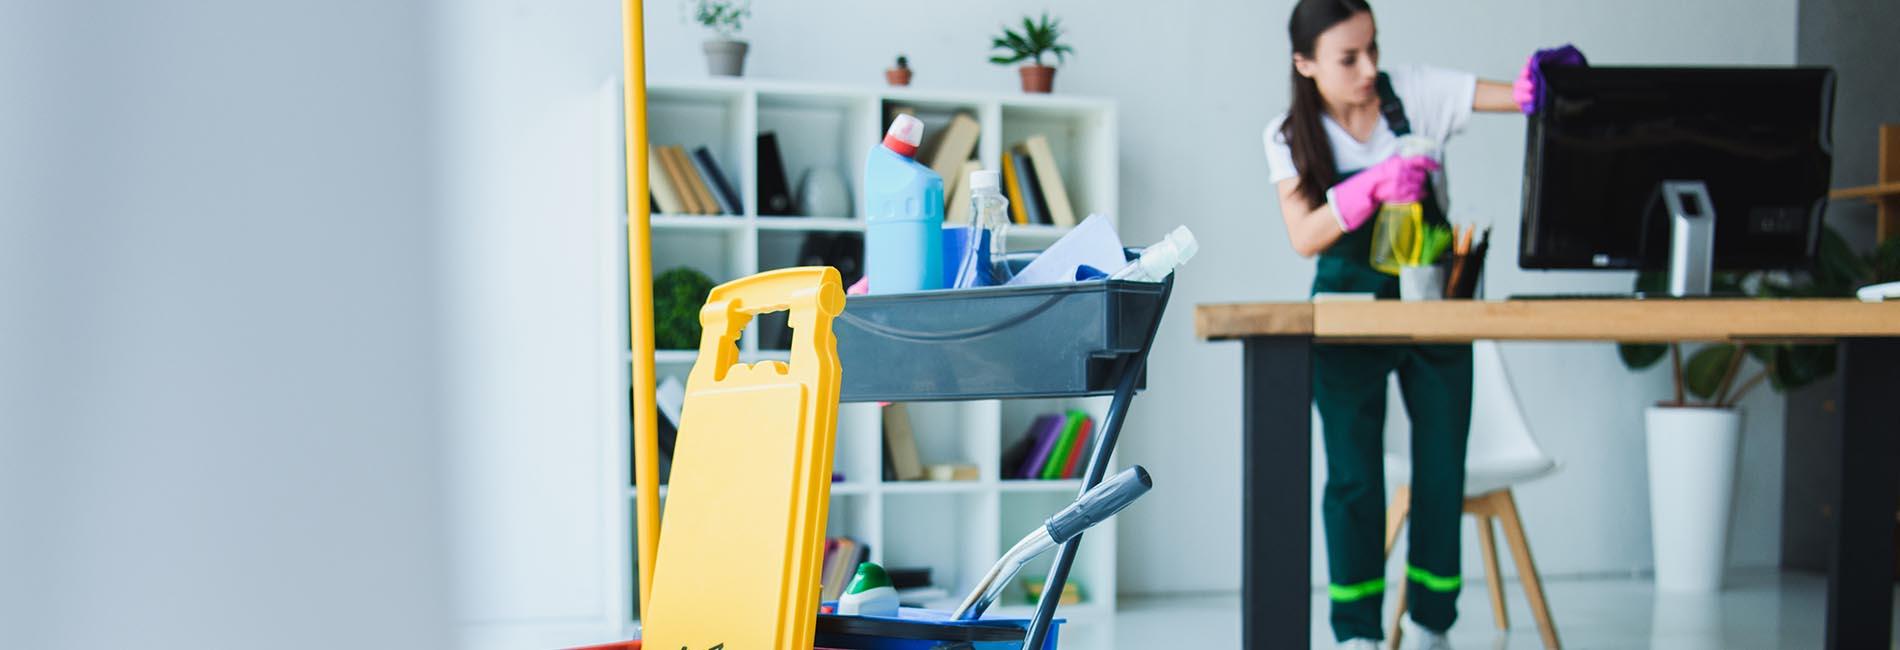 pulizie uffici - pulizie commerciali a saronno